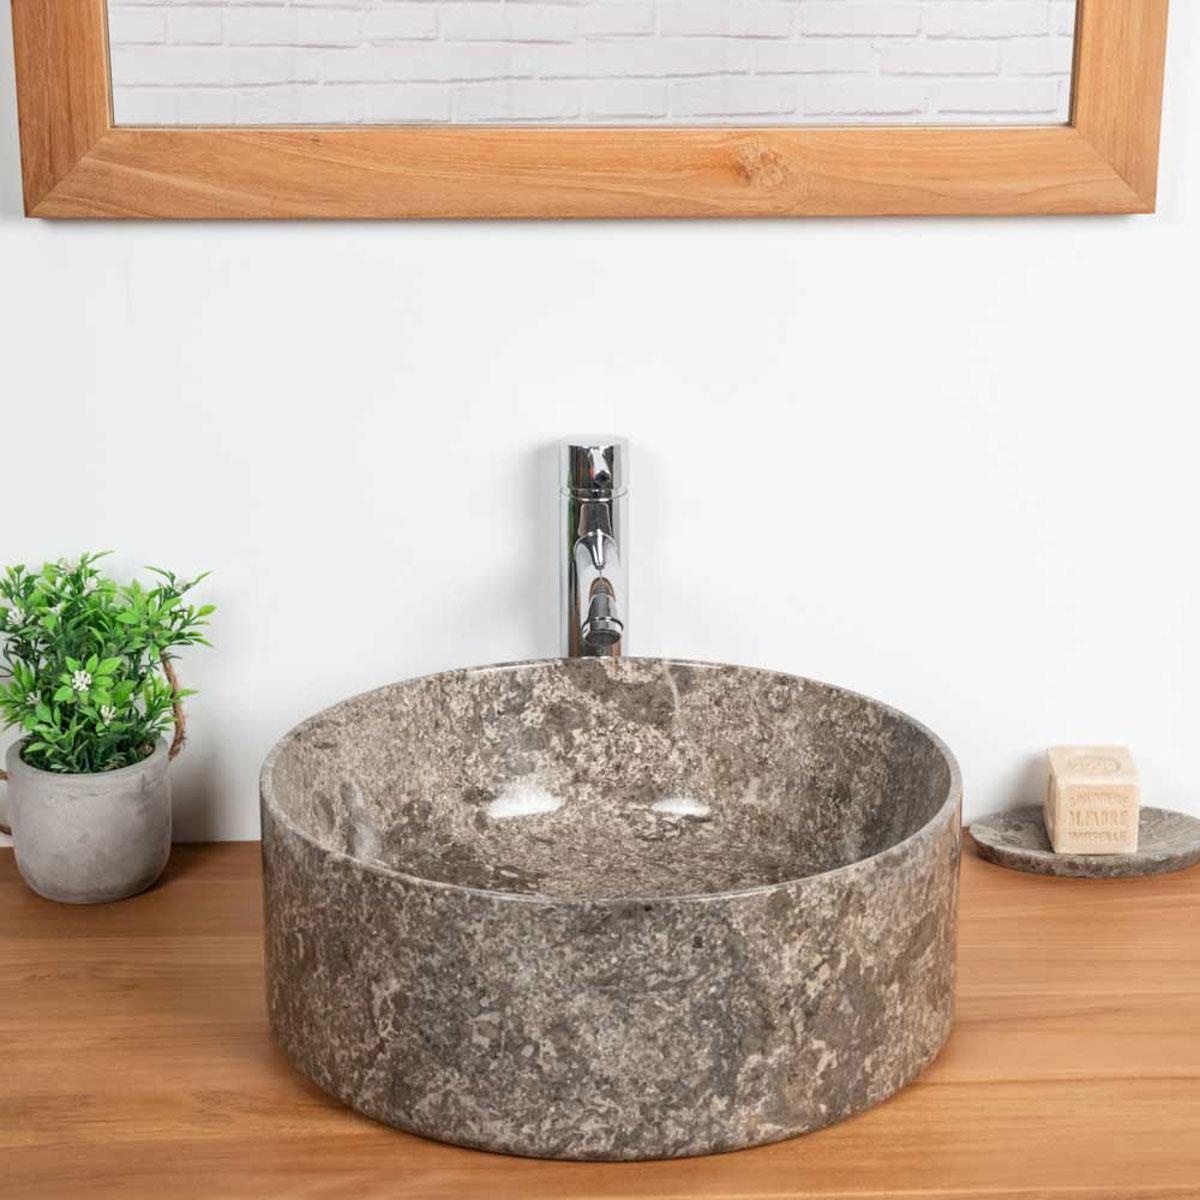 vasque poser en marbre pour salle de bain ulysse 40 gris. Black Bedroom Furniture Sets. Home Design Ideas